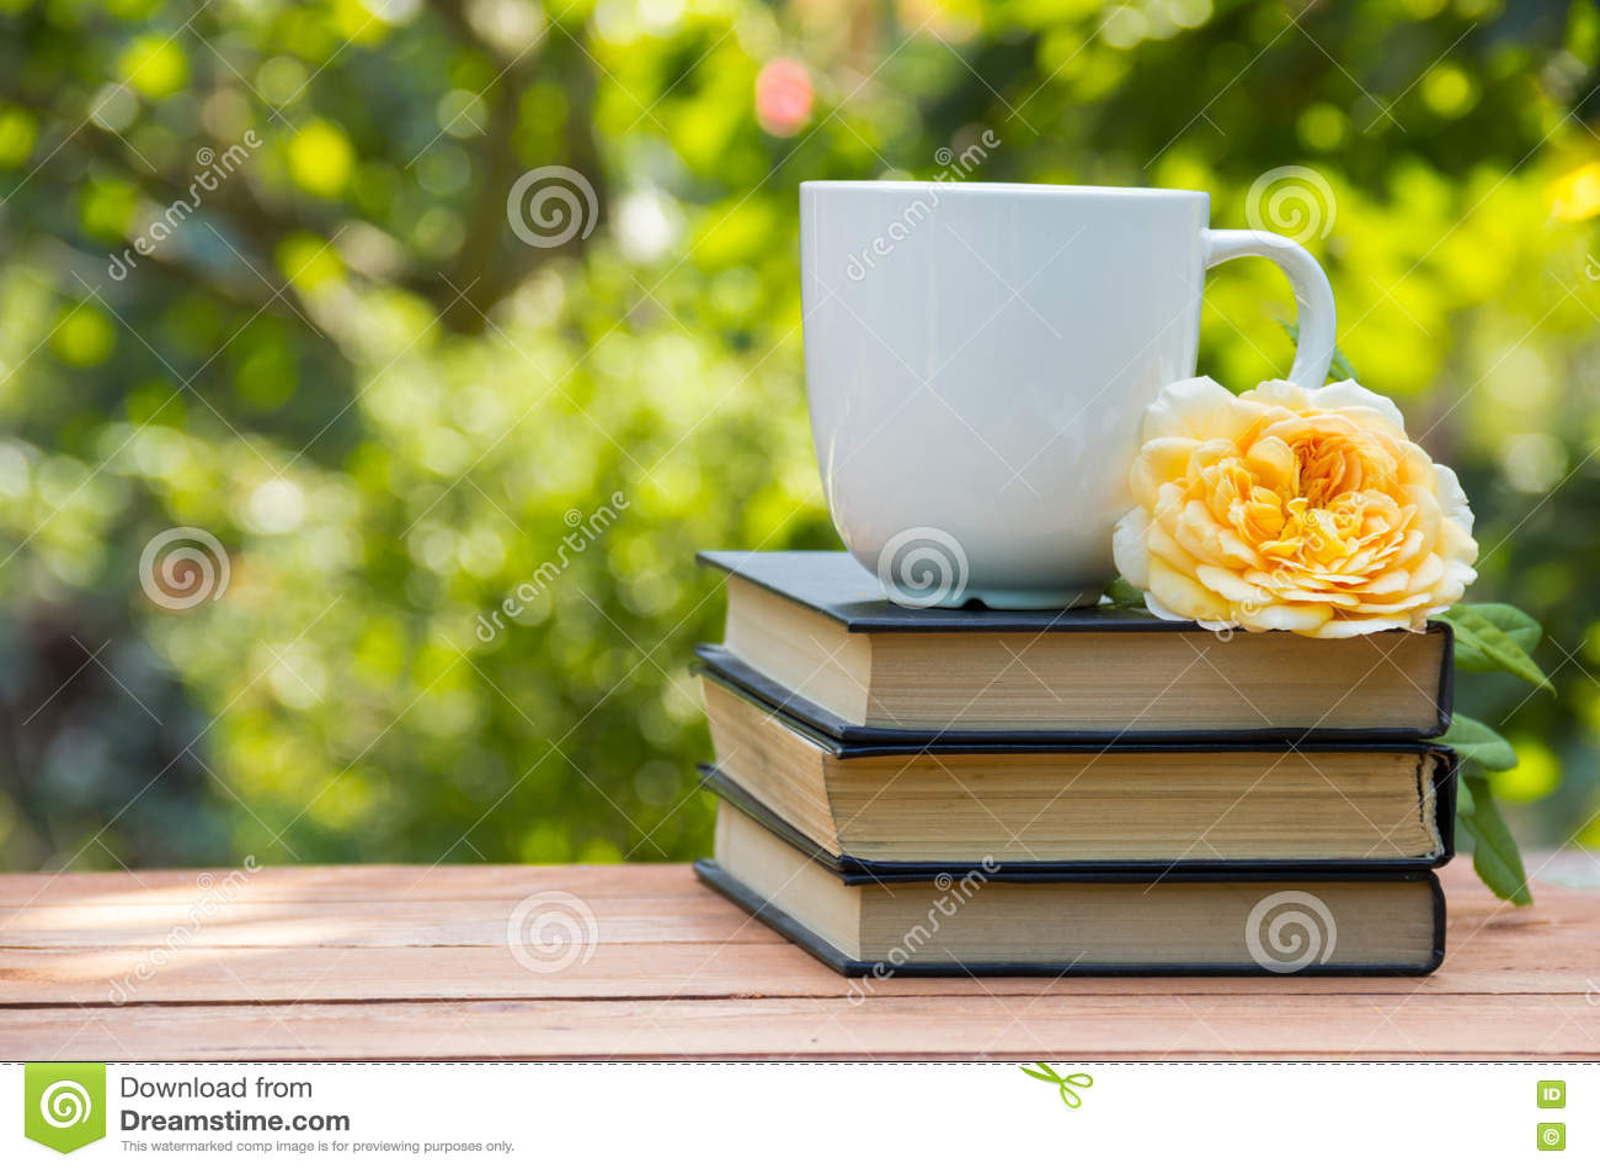 Rose Symbol In Tea Leaves